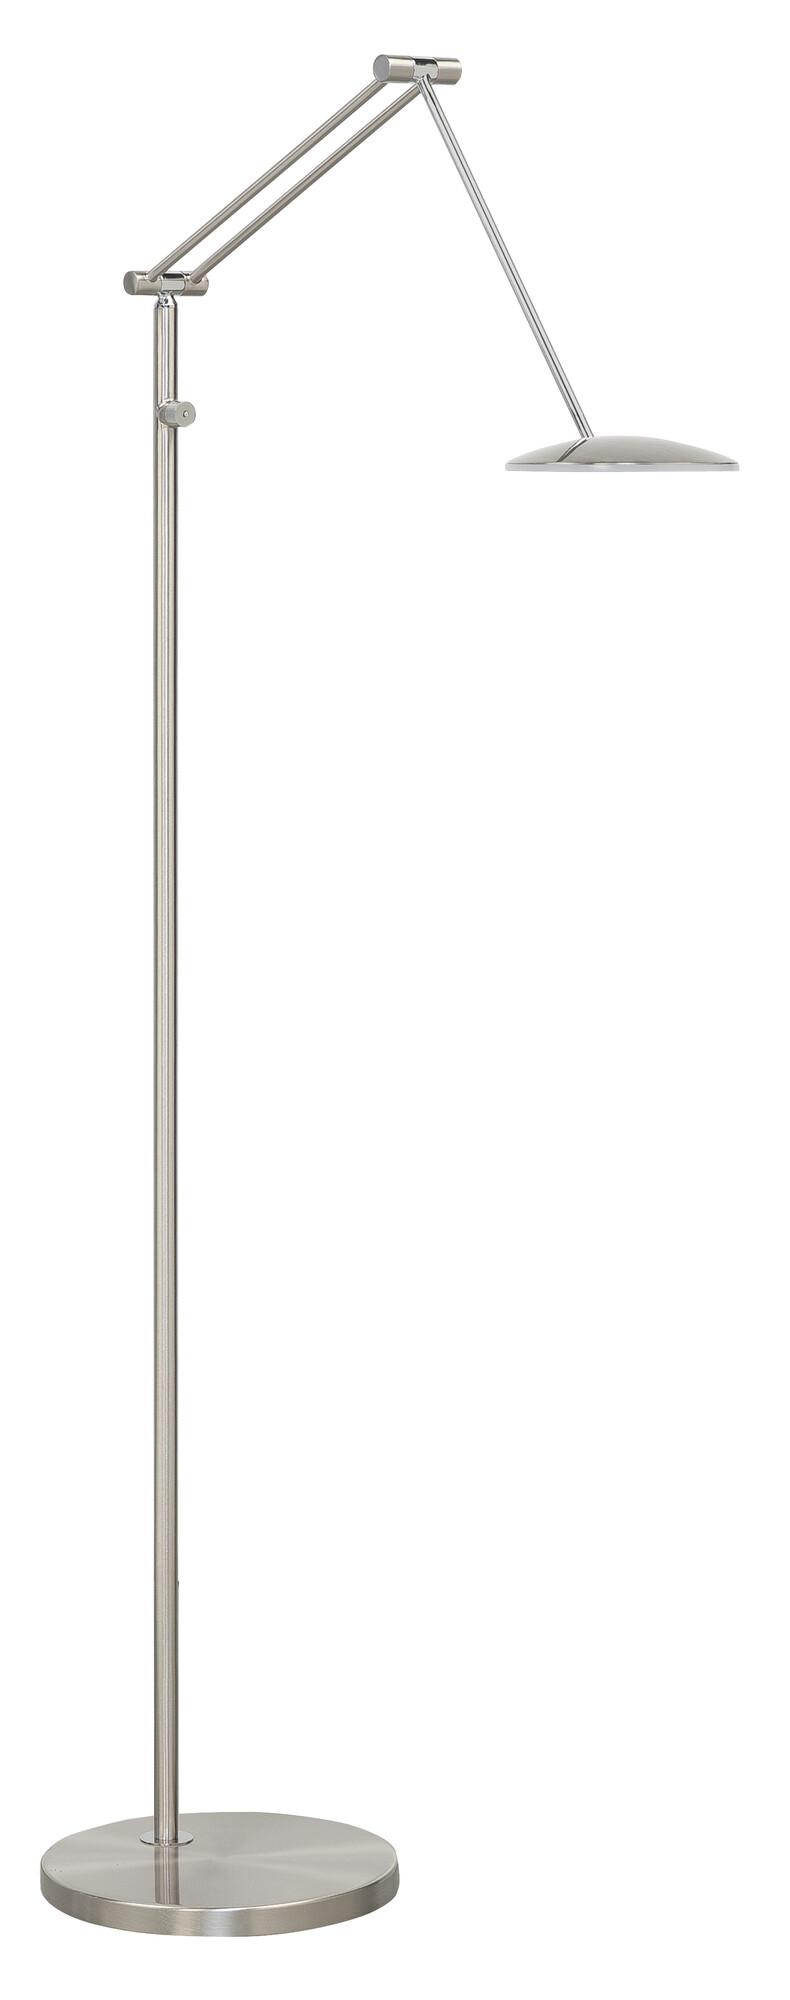 SAPPORO Lampadaire LED 1x10W/700lm Argent